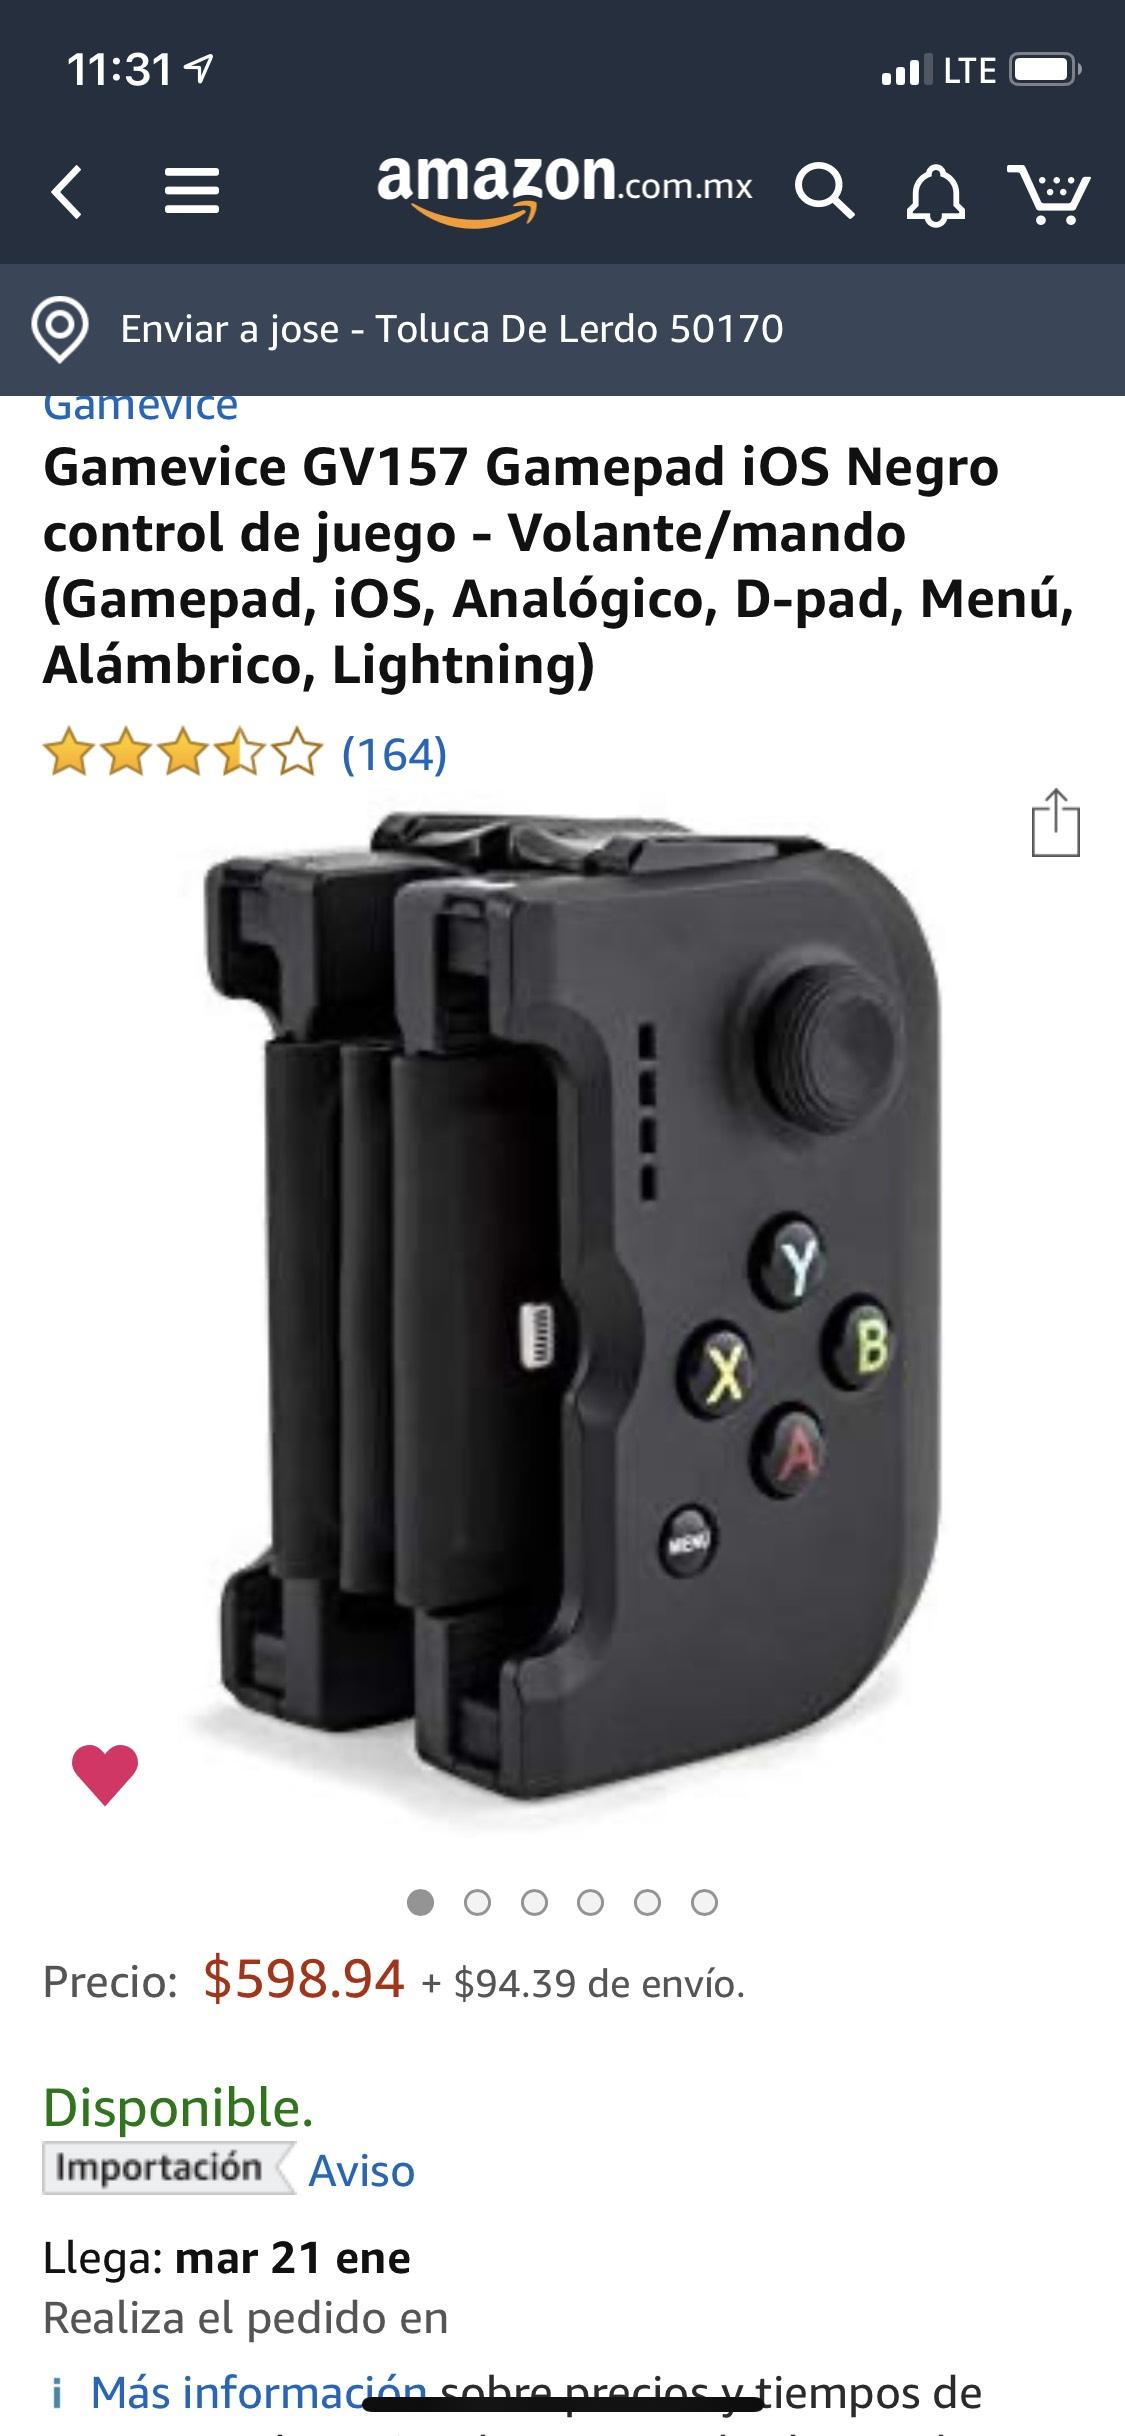 Amazon Gamevice GV157 precio normal Roa da los $1500